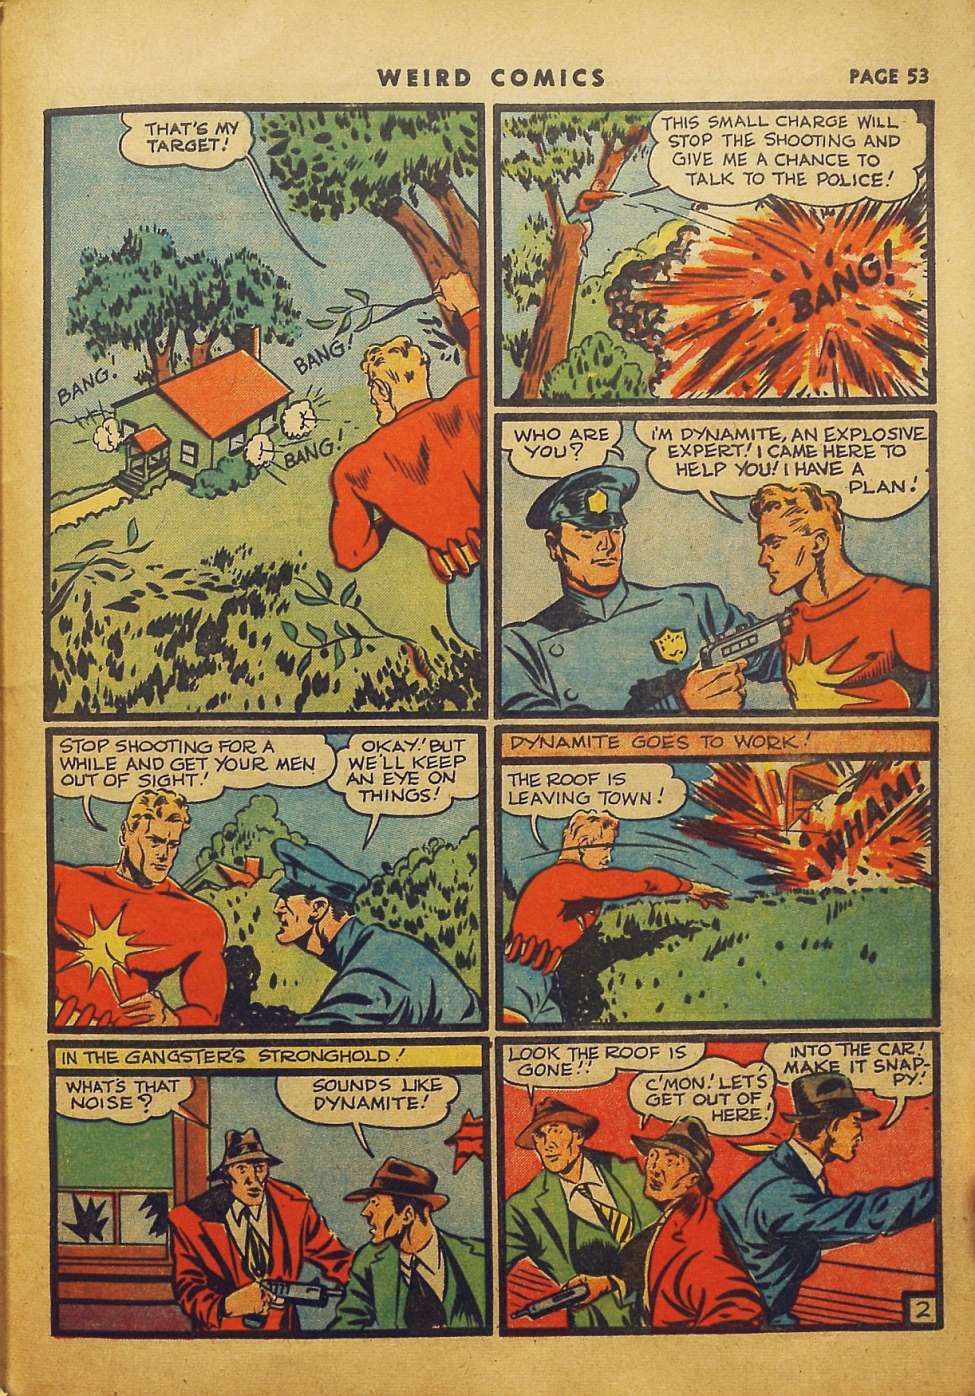 Comic Book Cover For Weird Comics #6 - Version 2